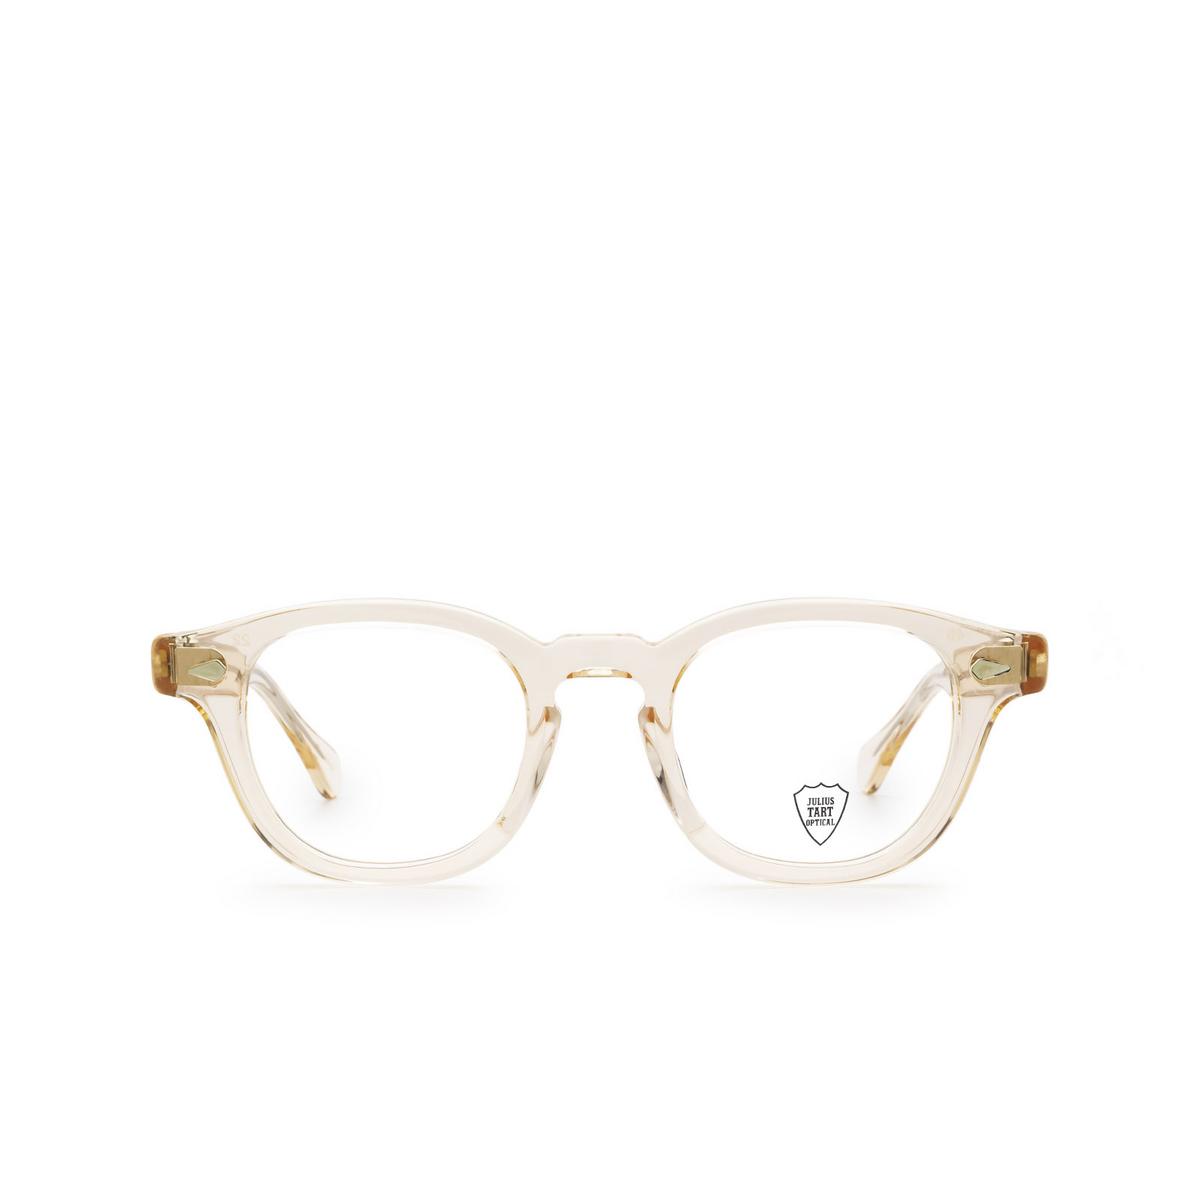 Julius Tart Optical® Square Eyeglasses: Ar color Flesh Pink - front view.